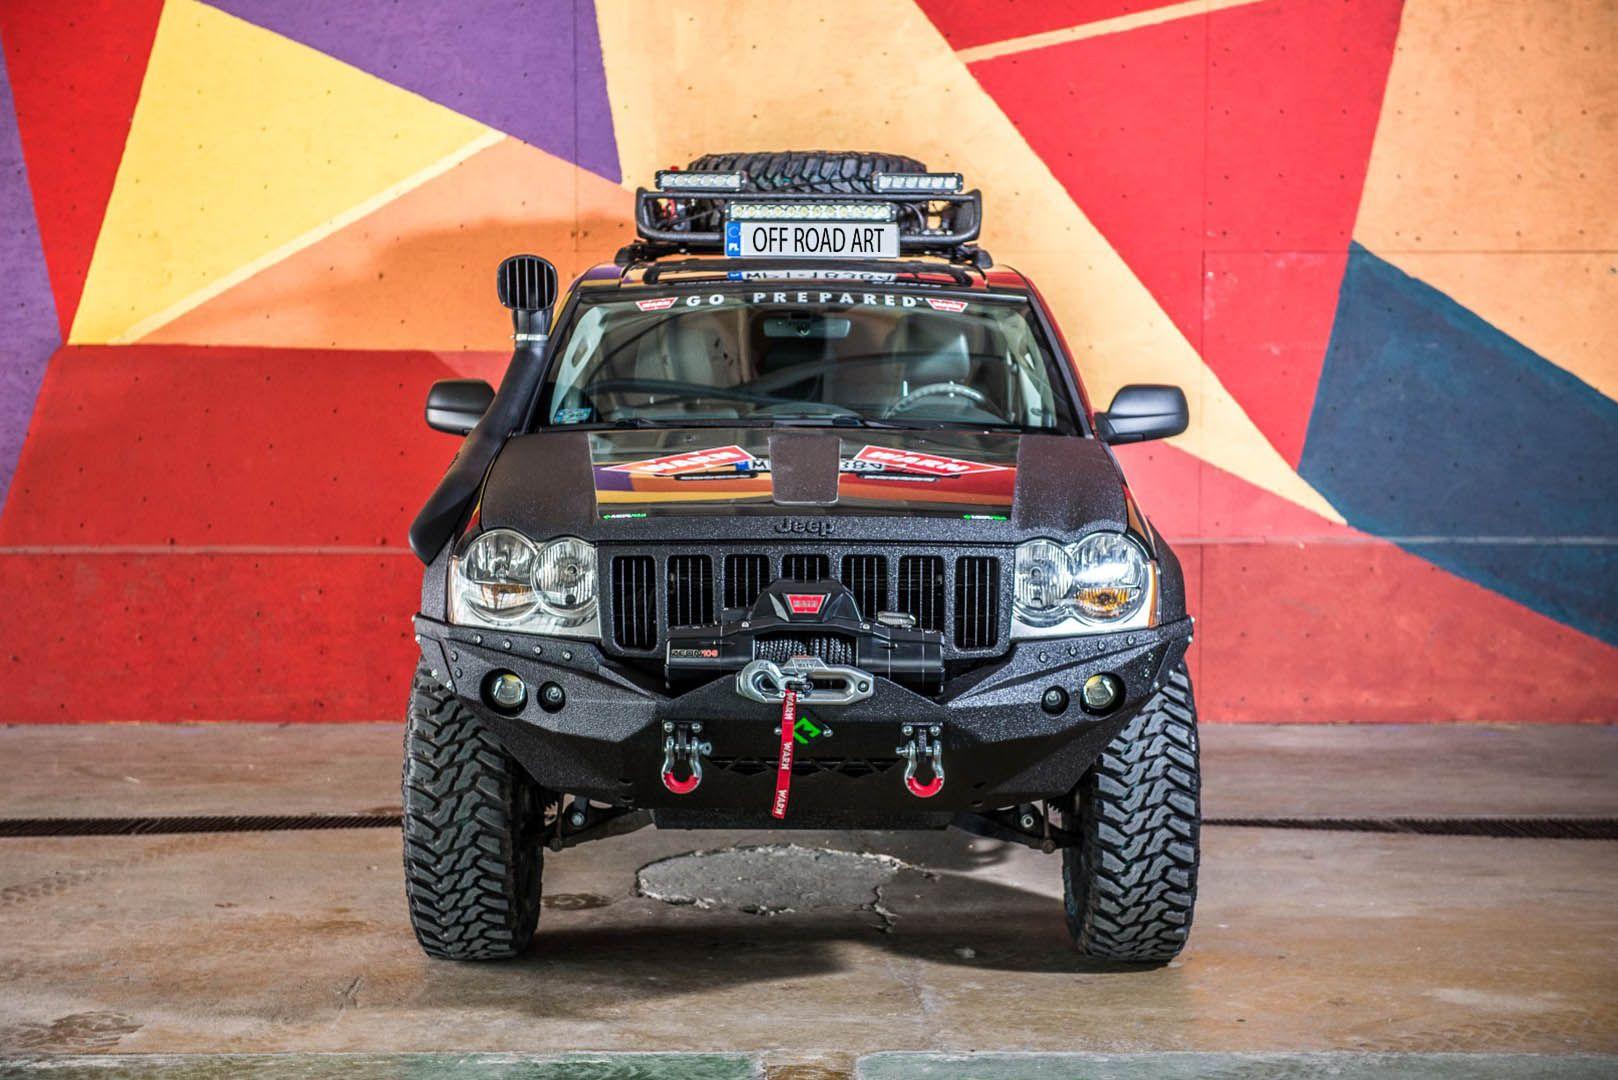 Psz 8765 Large Jeep Grand Cherokee Jeep Srt8 Jeep Wk